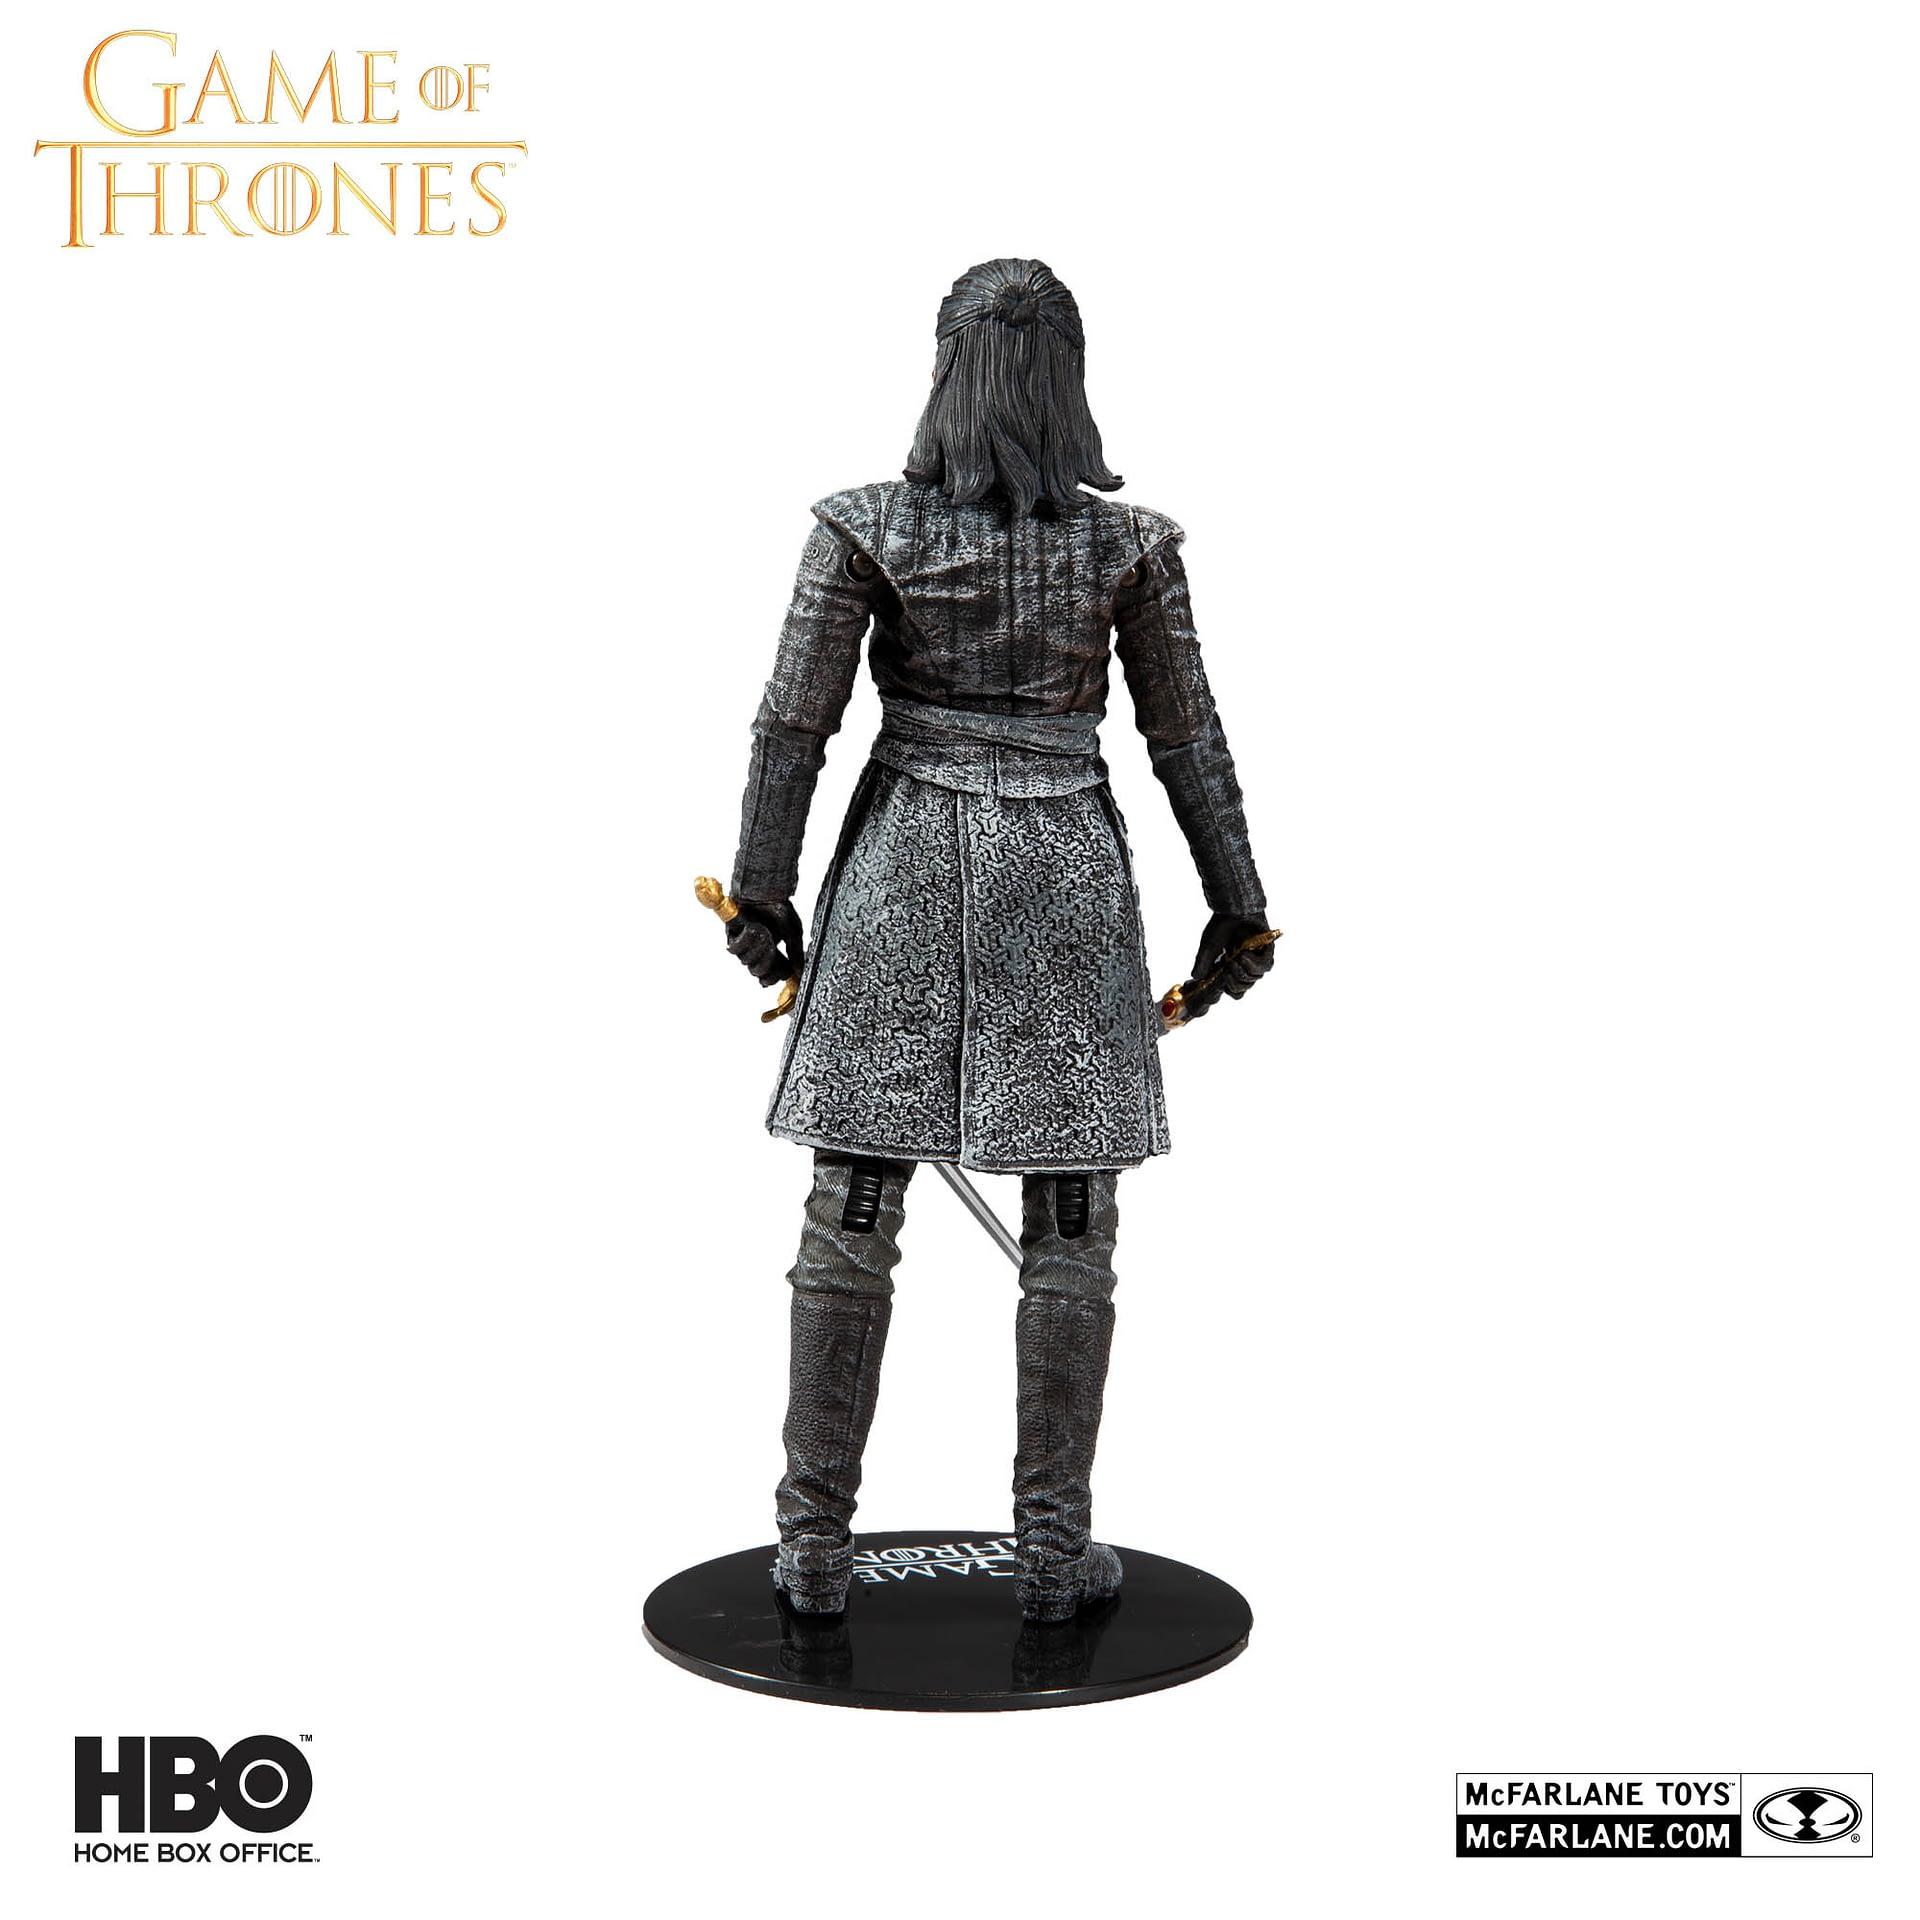 Arya Stark Escapes Kings Landing with New McFarlane Figure